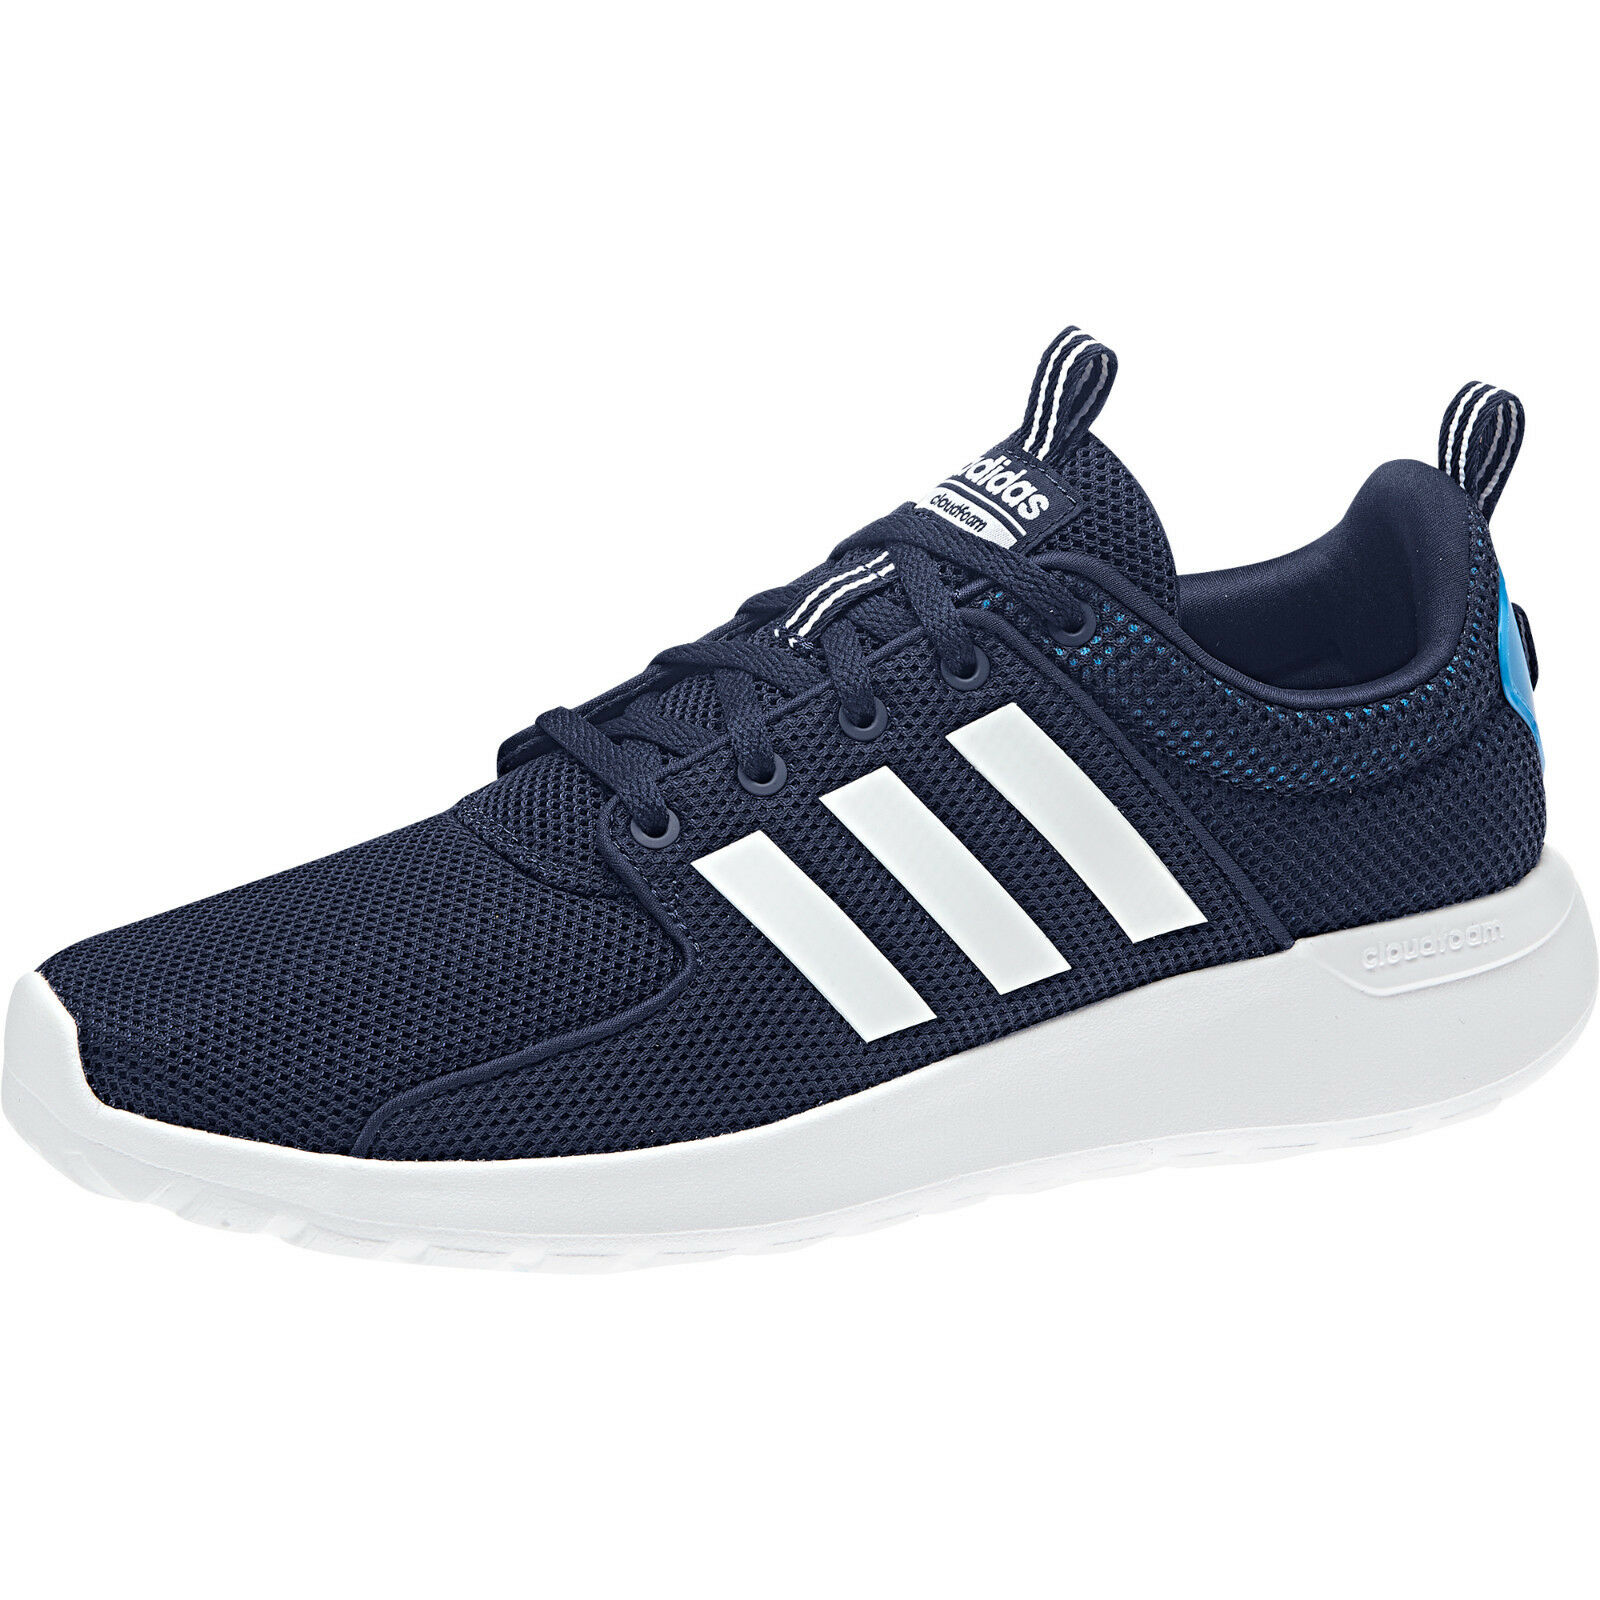 Adidas Scarpe da Uomo Cf Lite Racer Palestra Fitnesstrainers B42167 Strada Corsa